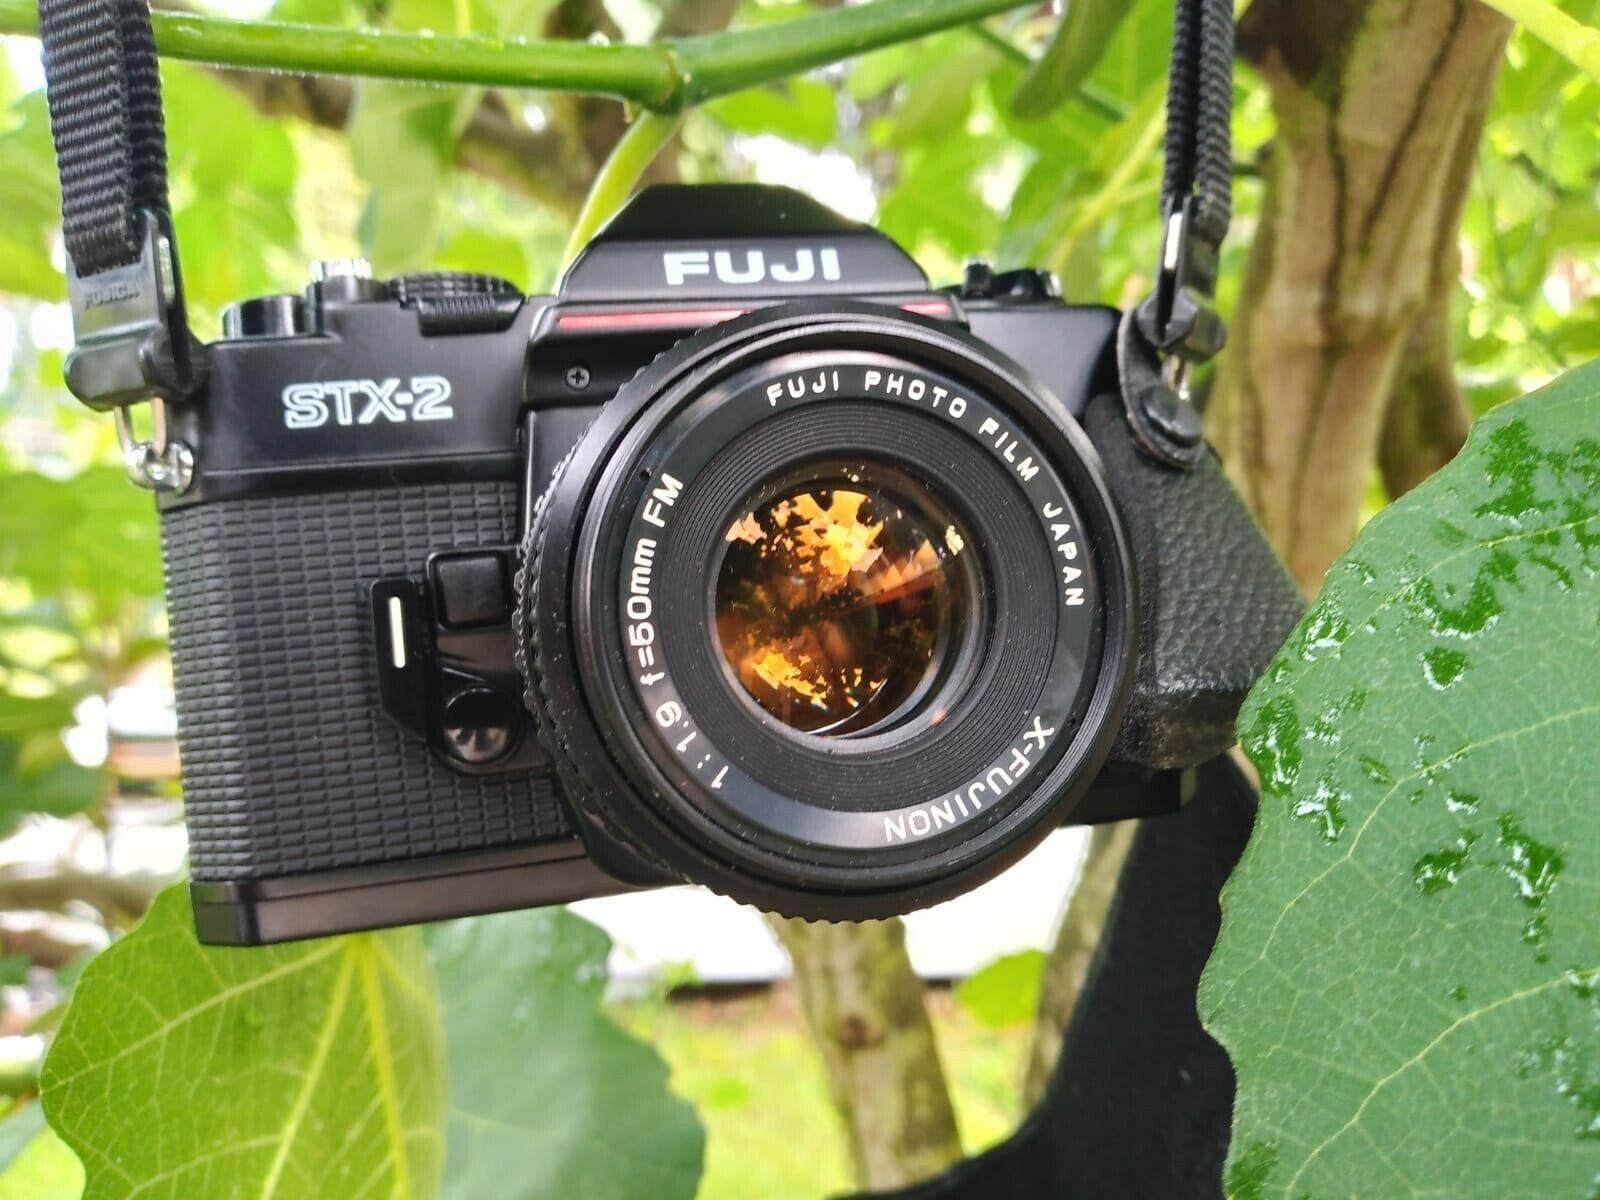 FUJI SLR Kamera STX-2 Analoge Spiegelreflexkamera Objektiv50mm Manual Fokus